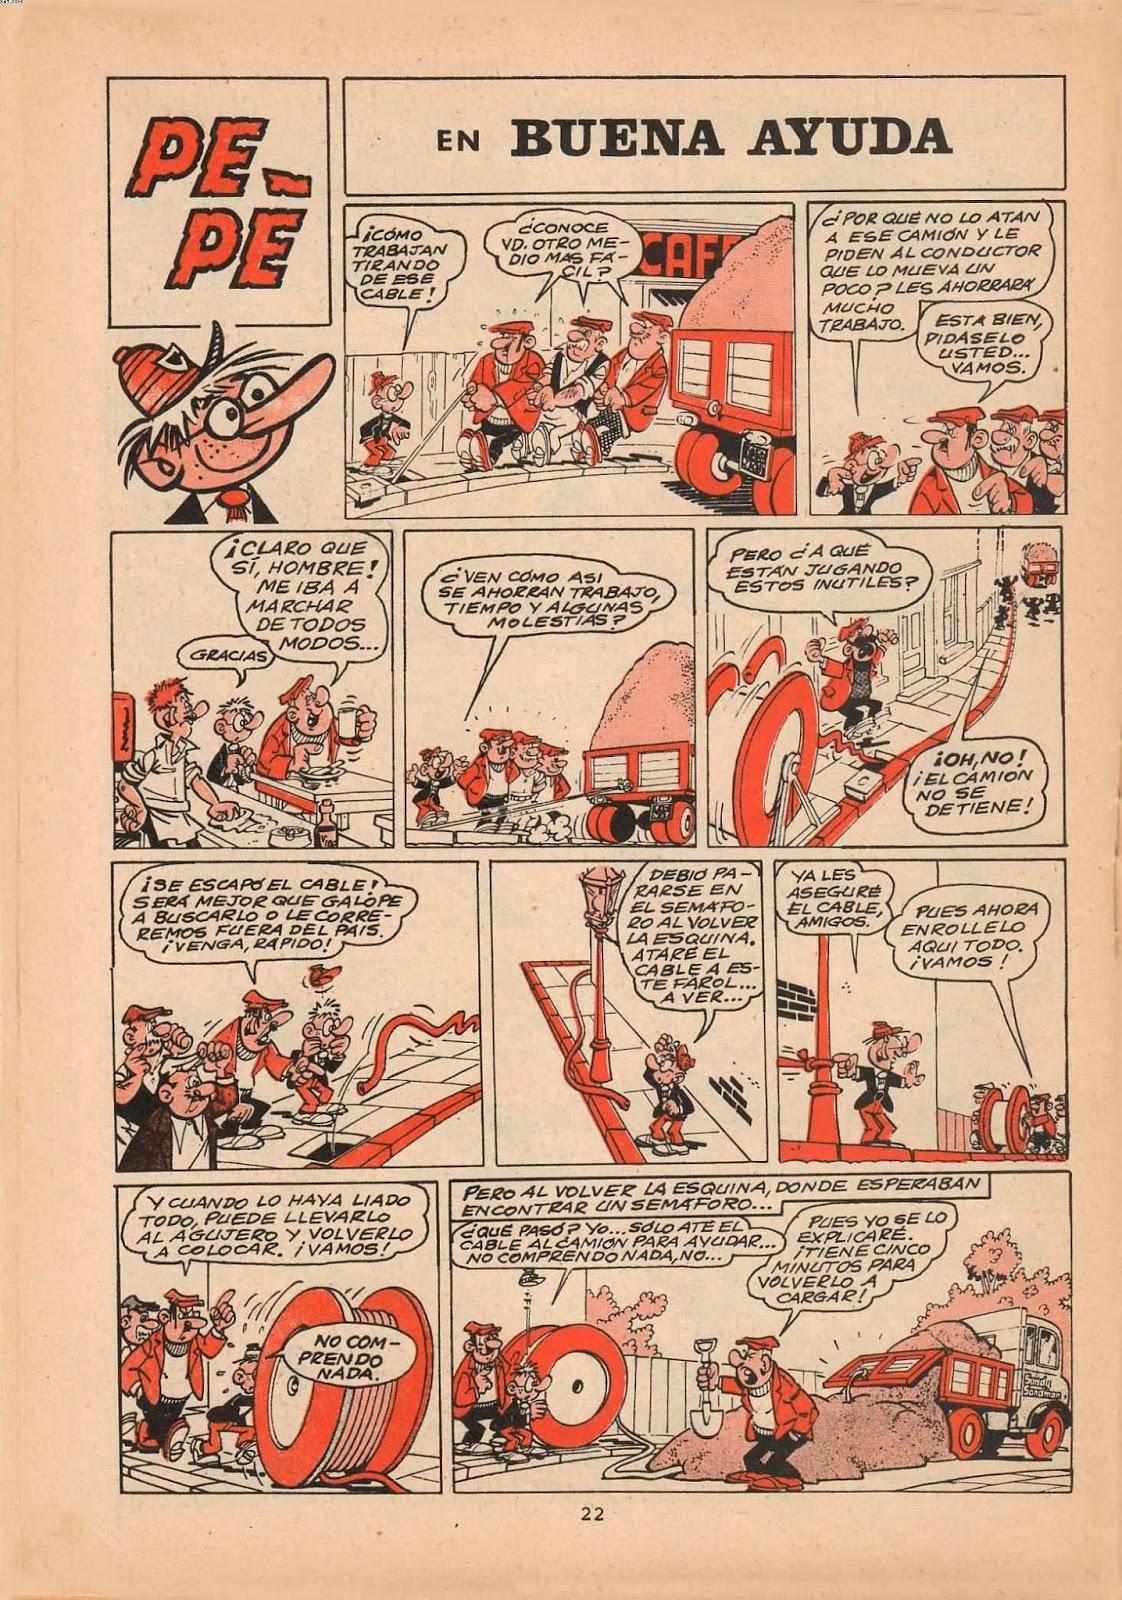 Pepe (Nosey) por Cerdan, publicado por Selecciones de Jaimito nº 148